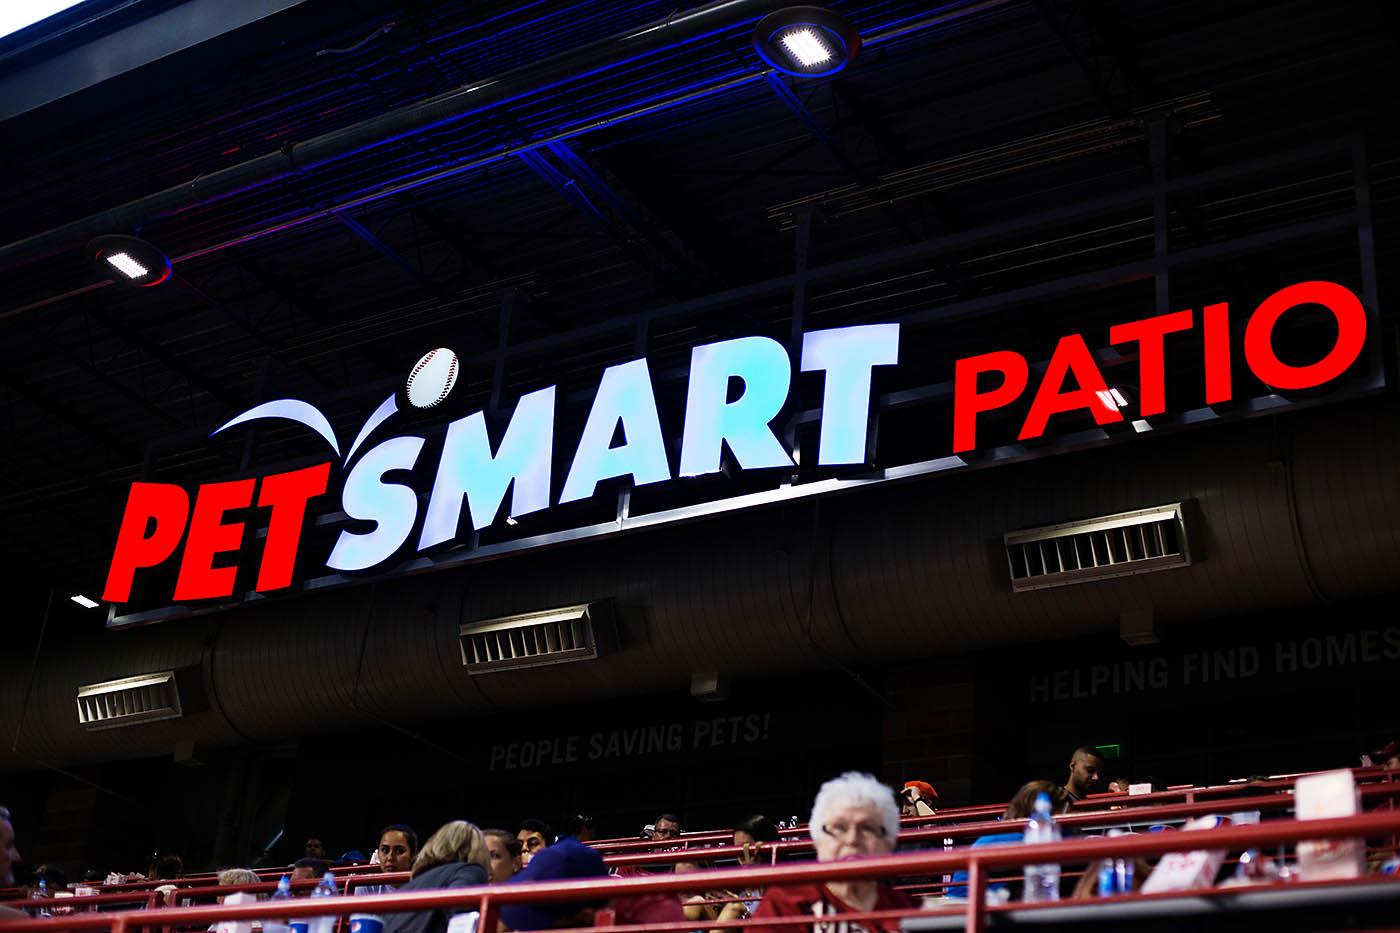 PetSmart Patio at Chase Field in Phoenix, AZ